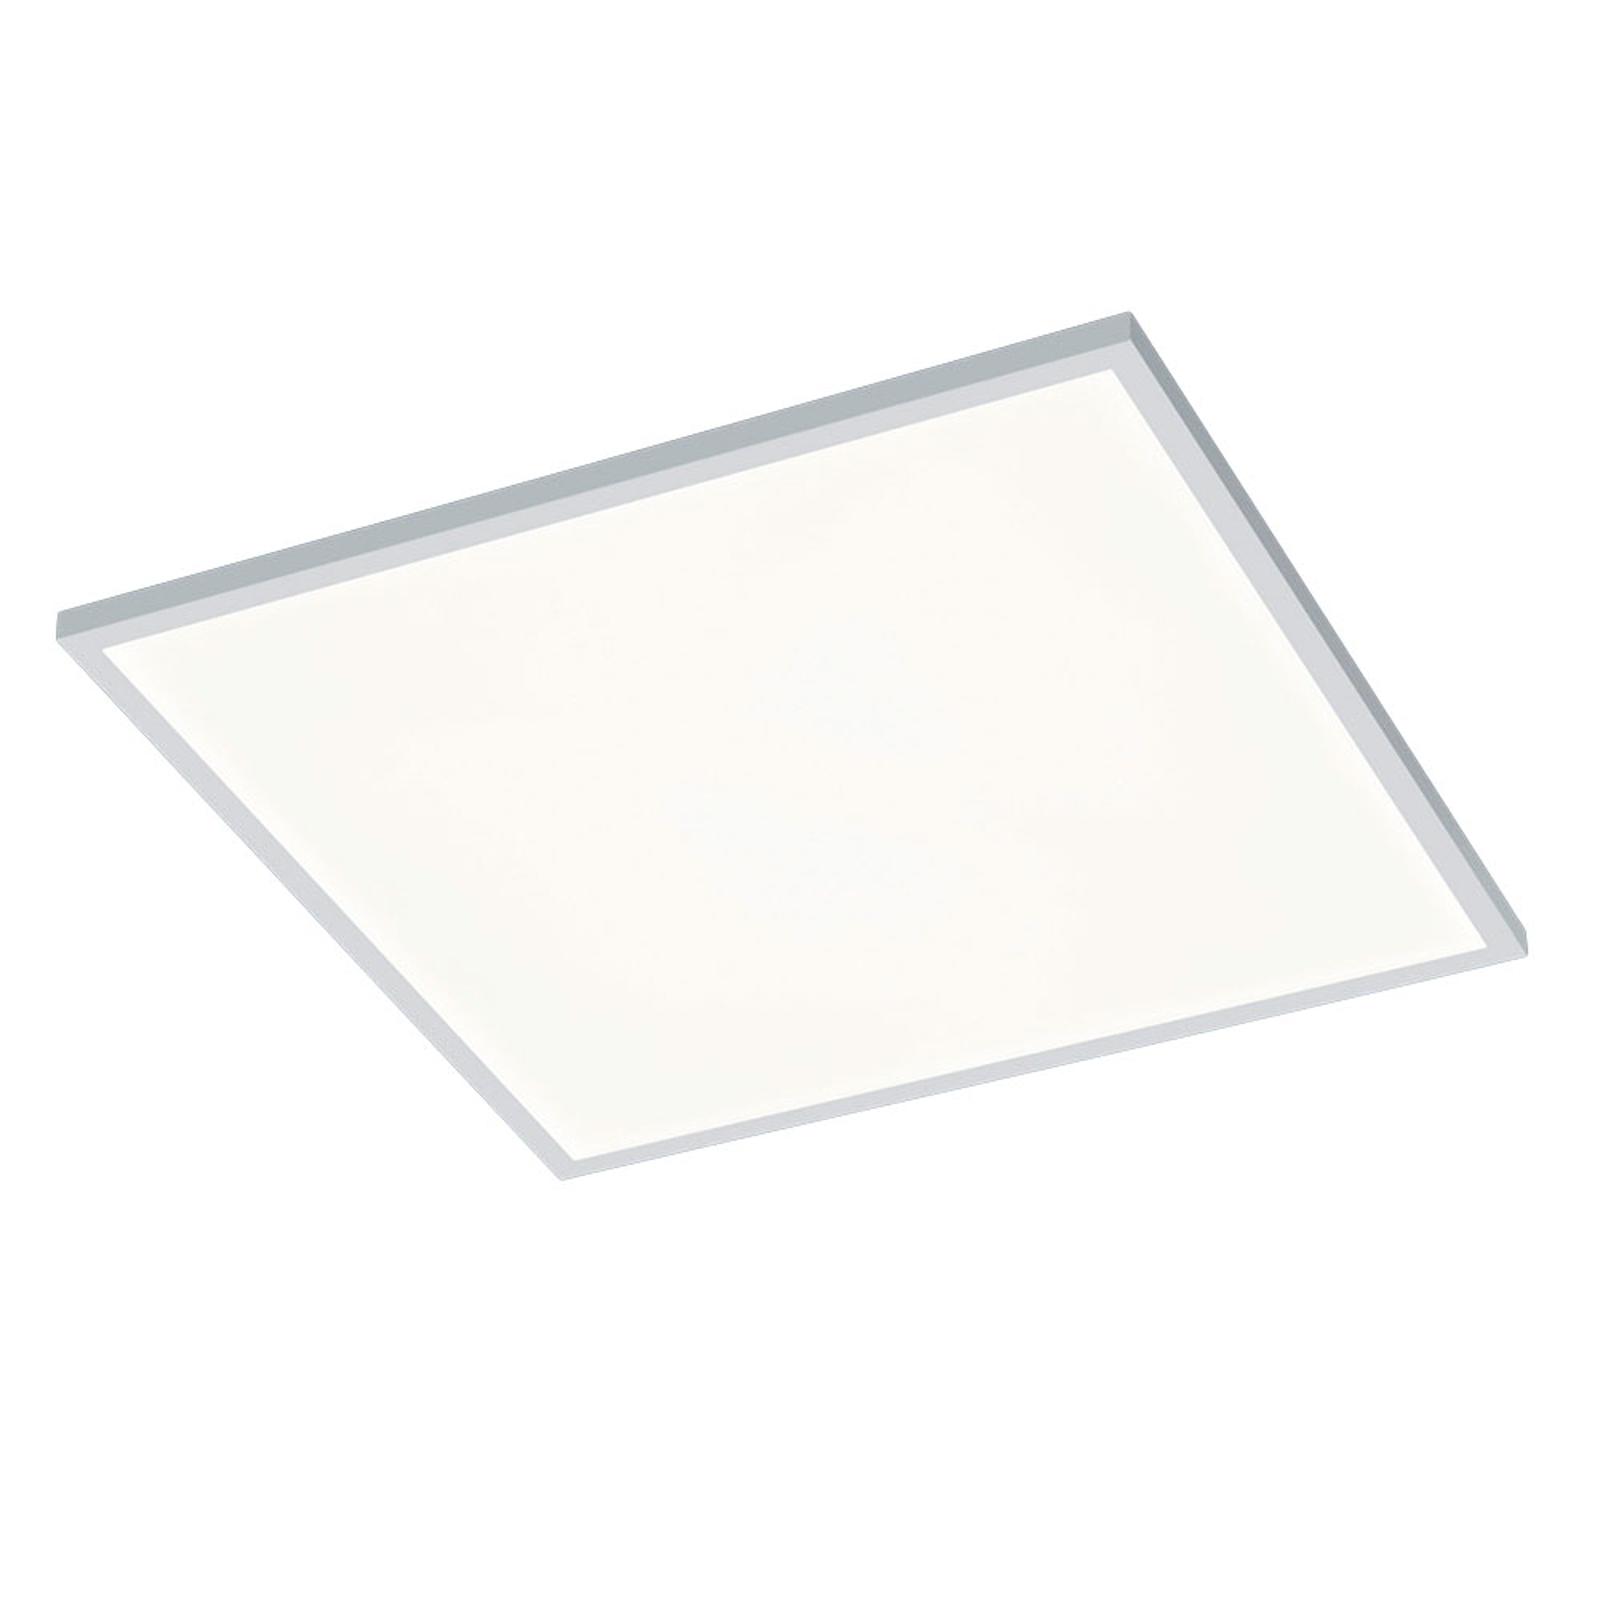 Helestra Rack LED-Deckenlampe dimmbar eckig weiß